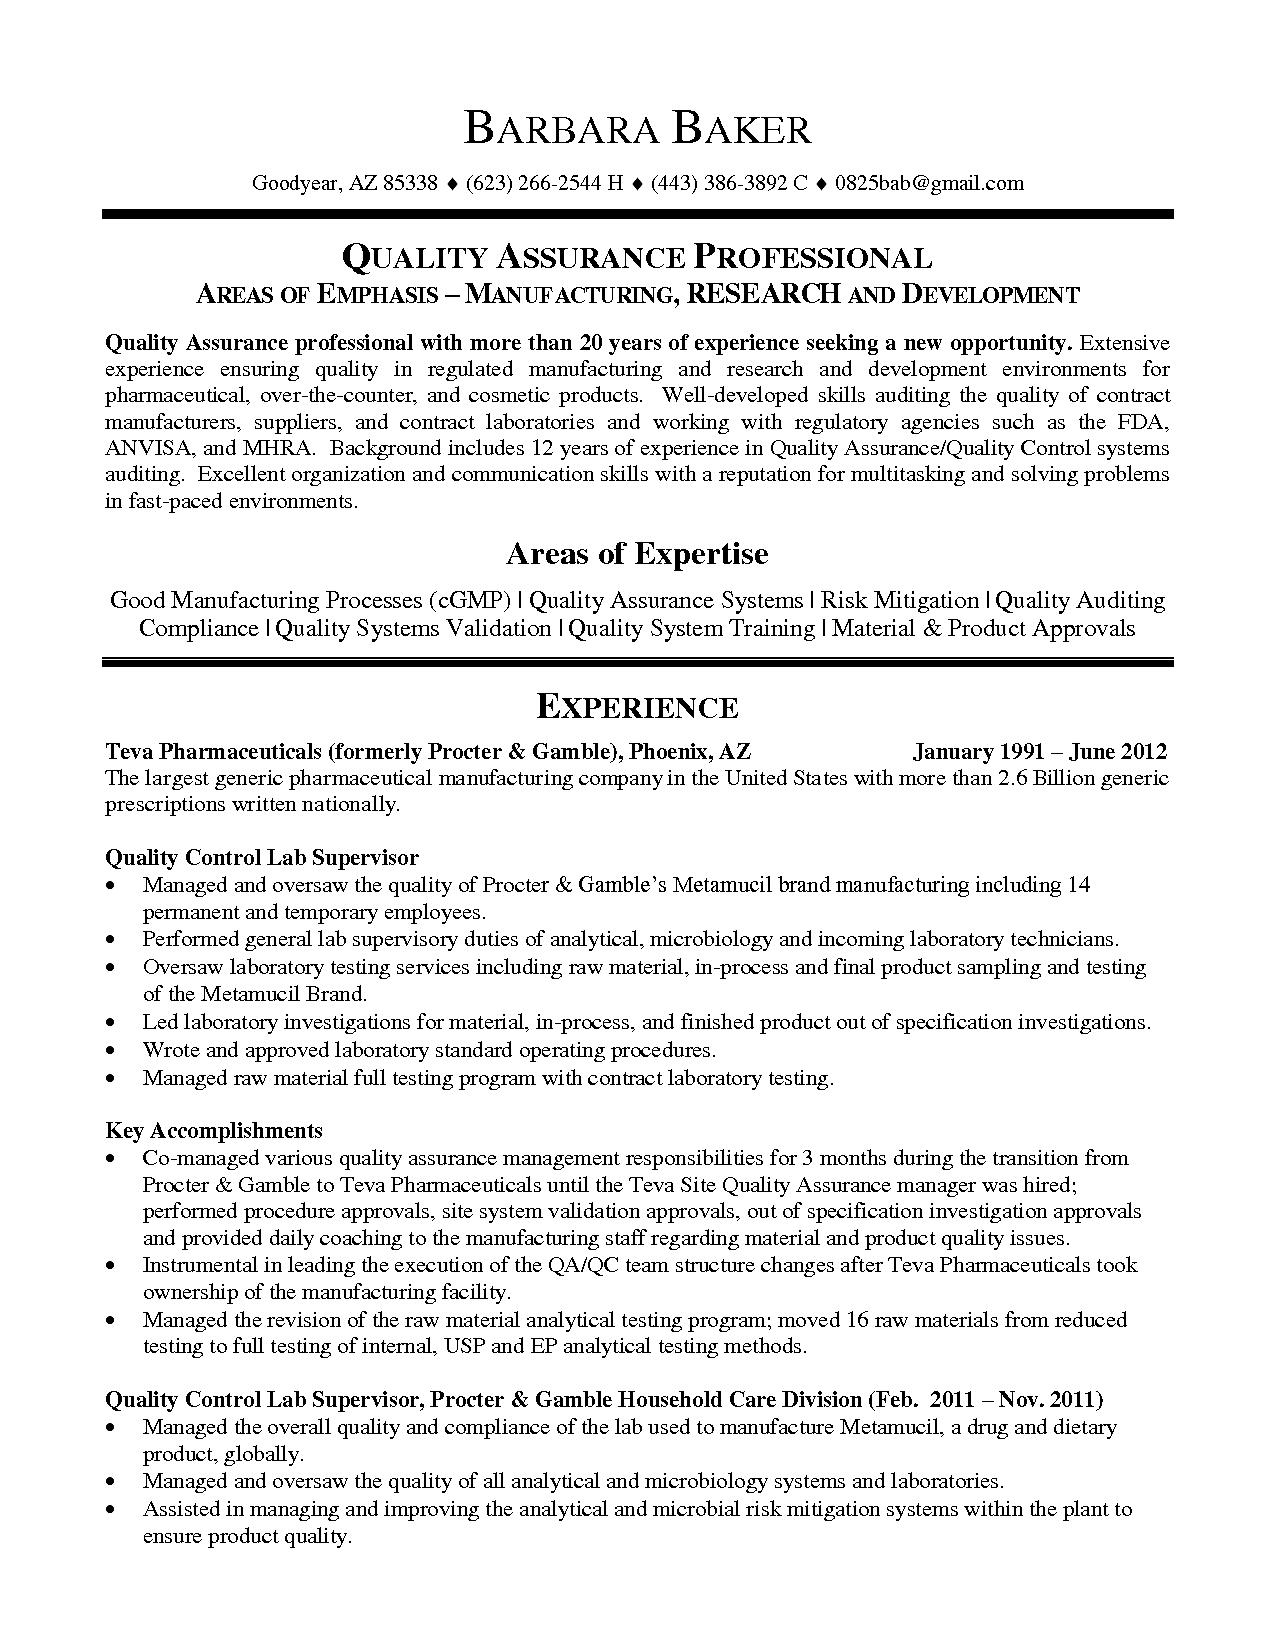 Transfer essay help